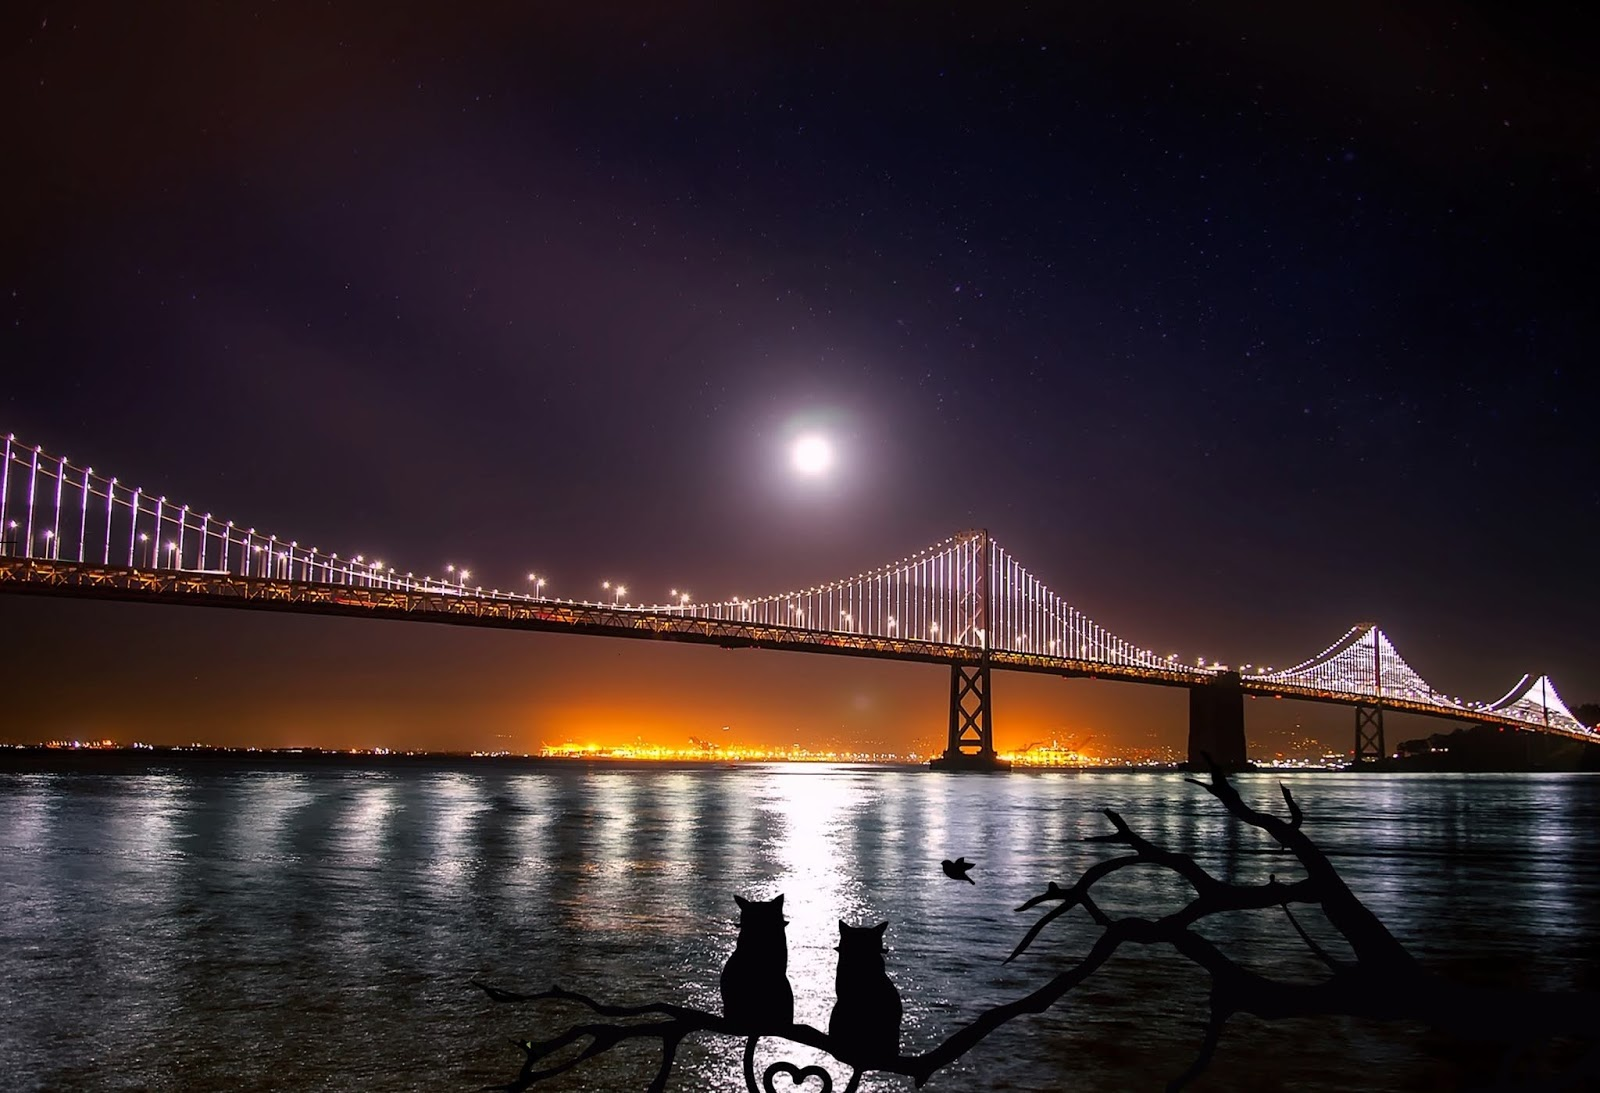 san francisco wallpaper hd,bridge,sky,night,water,cable stayed bridge